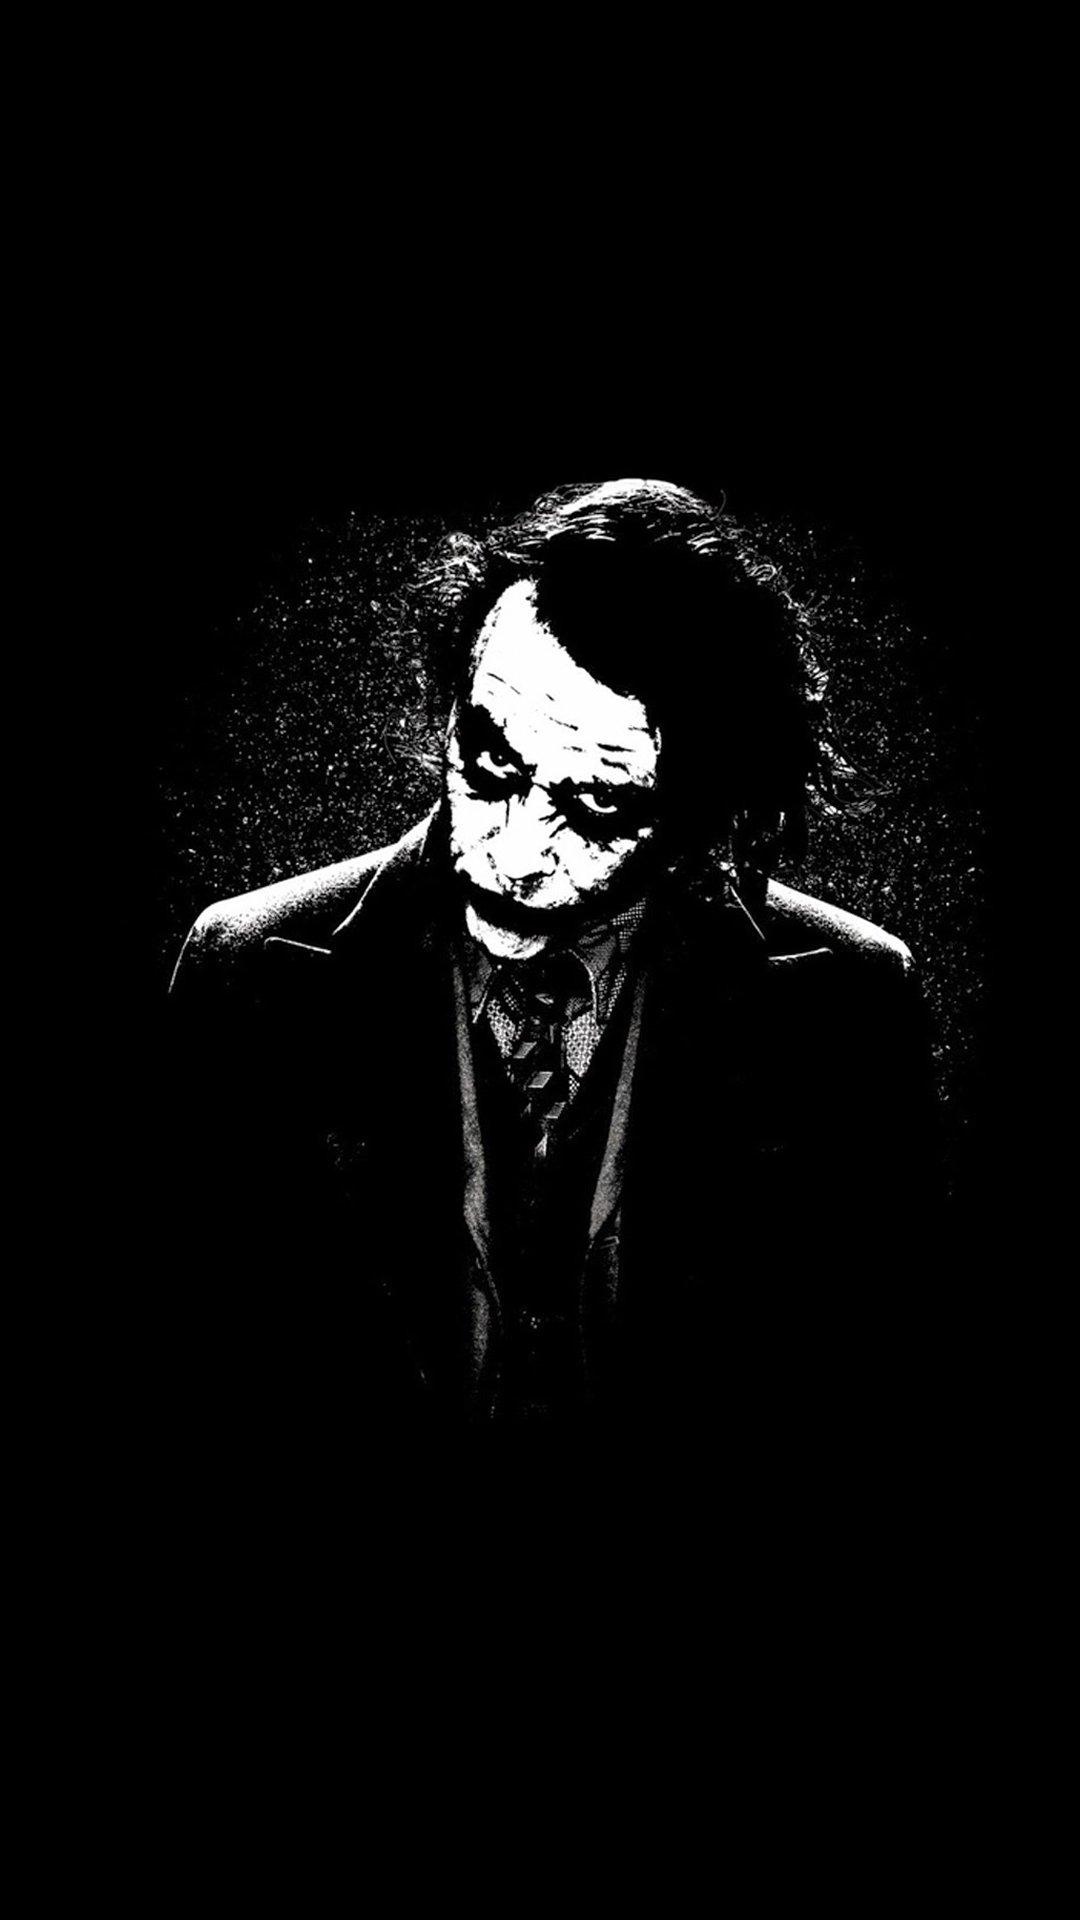 46 Joker Iphone 6 Wallpaper On Wallpapersafari